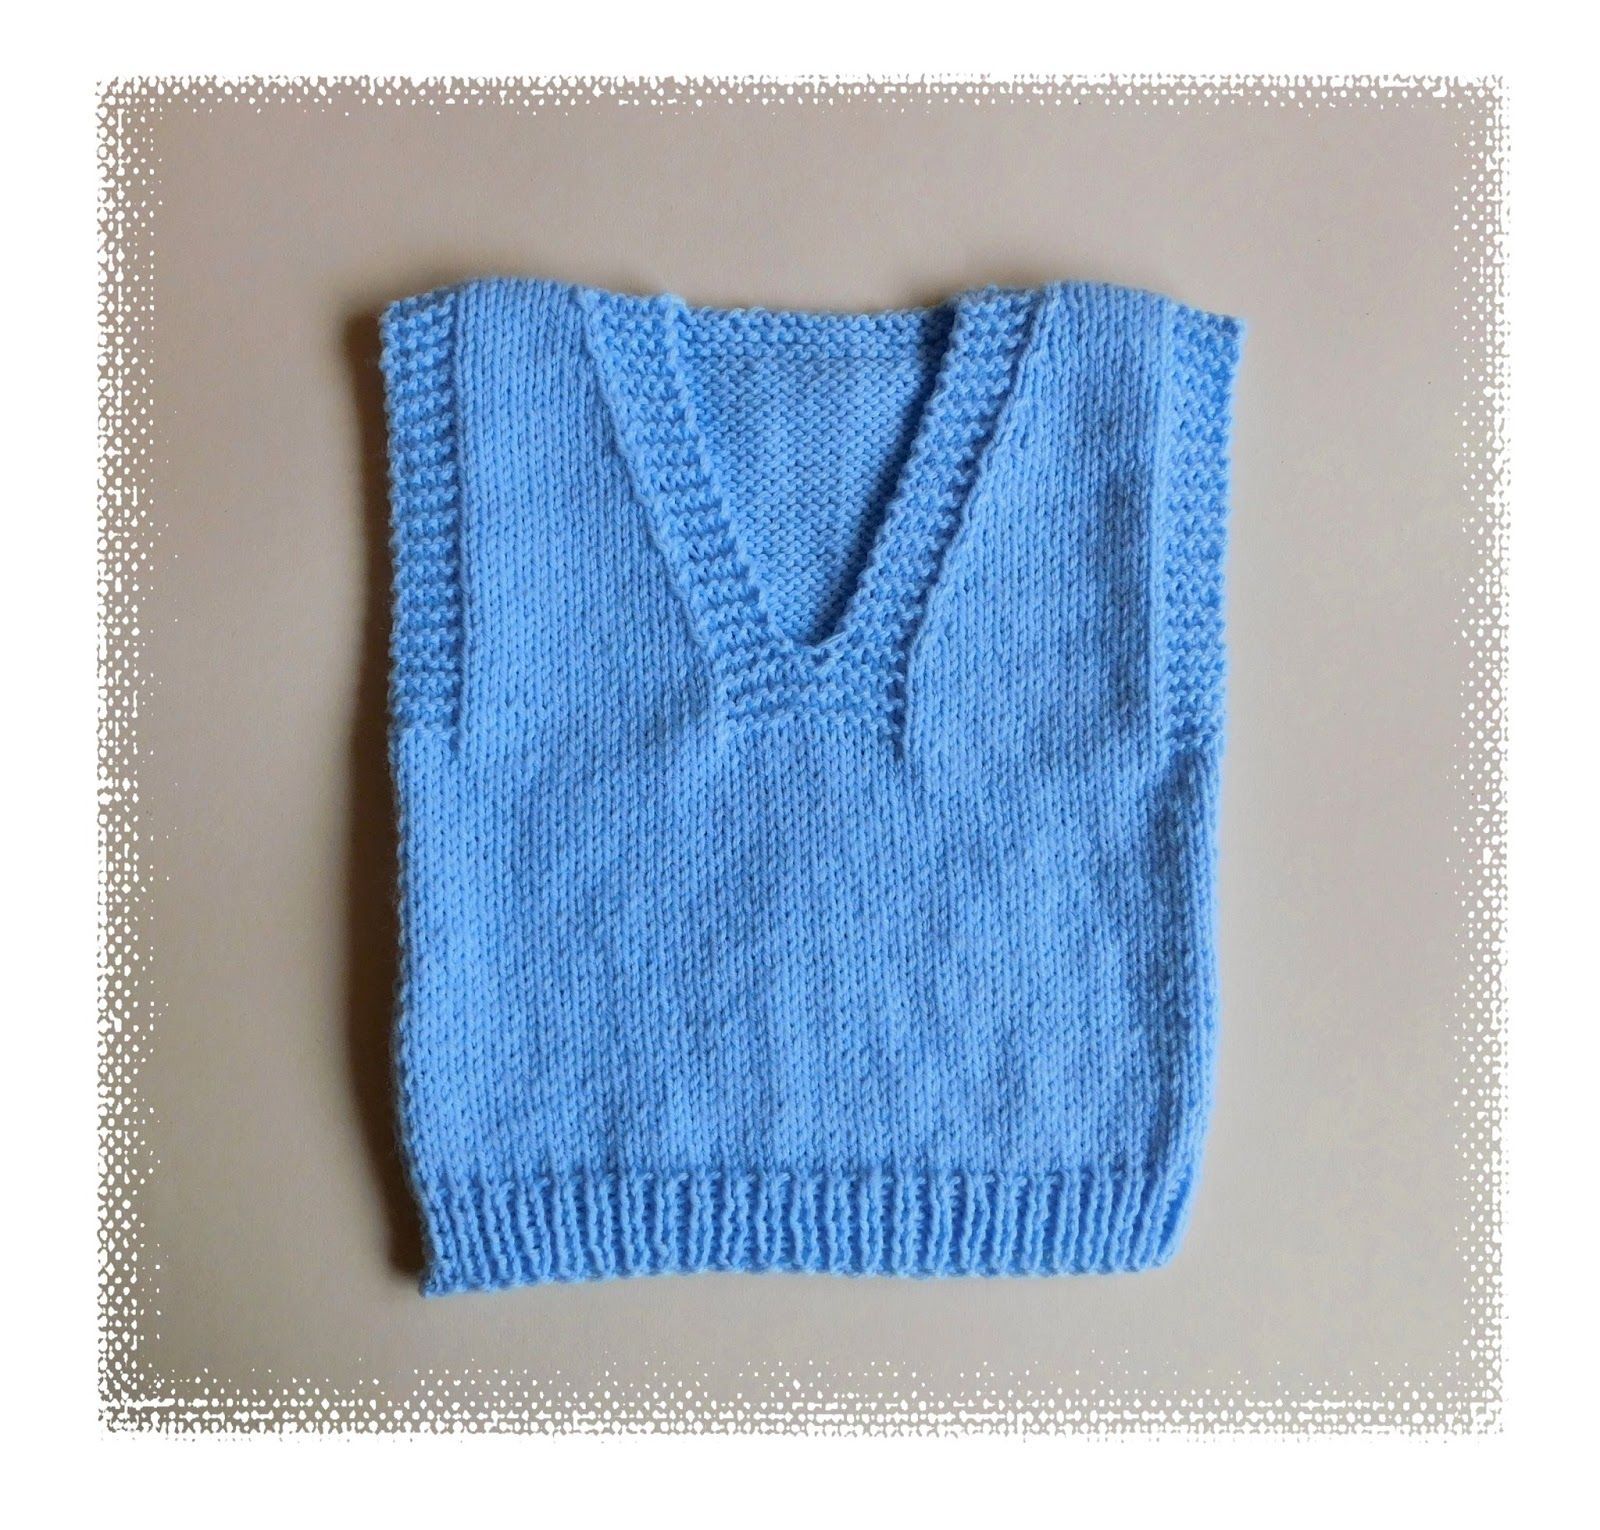 76793c1bc5cd3 Marianna s Lazy Daisy Days  DEXTER - Slipover Sweater   Vest Top